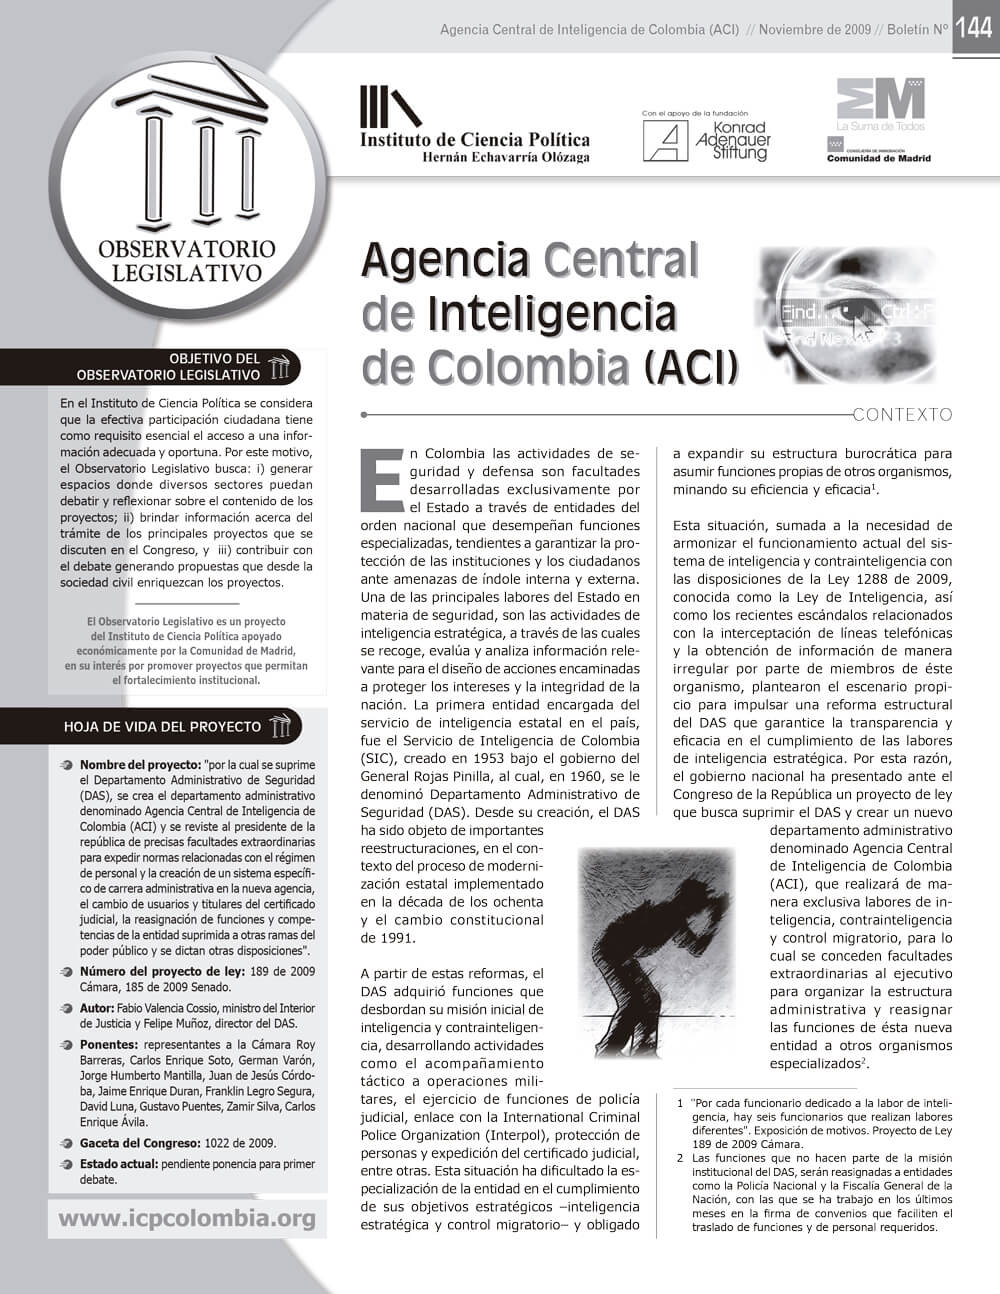 2009.11.01--Boletín-144-Agencia-Central-de-Inteligencia-de-Colombia-1